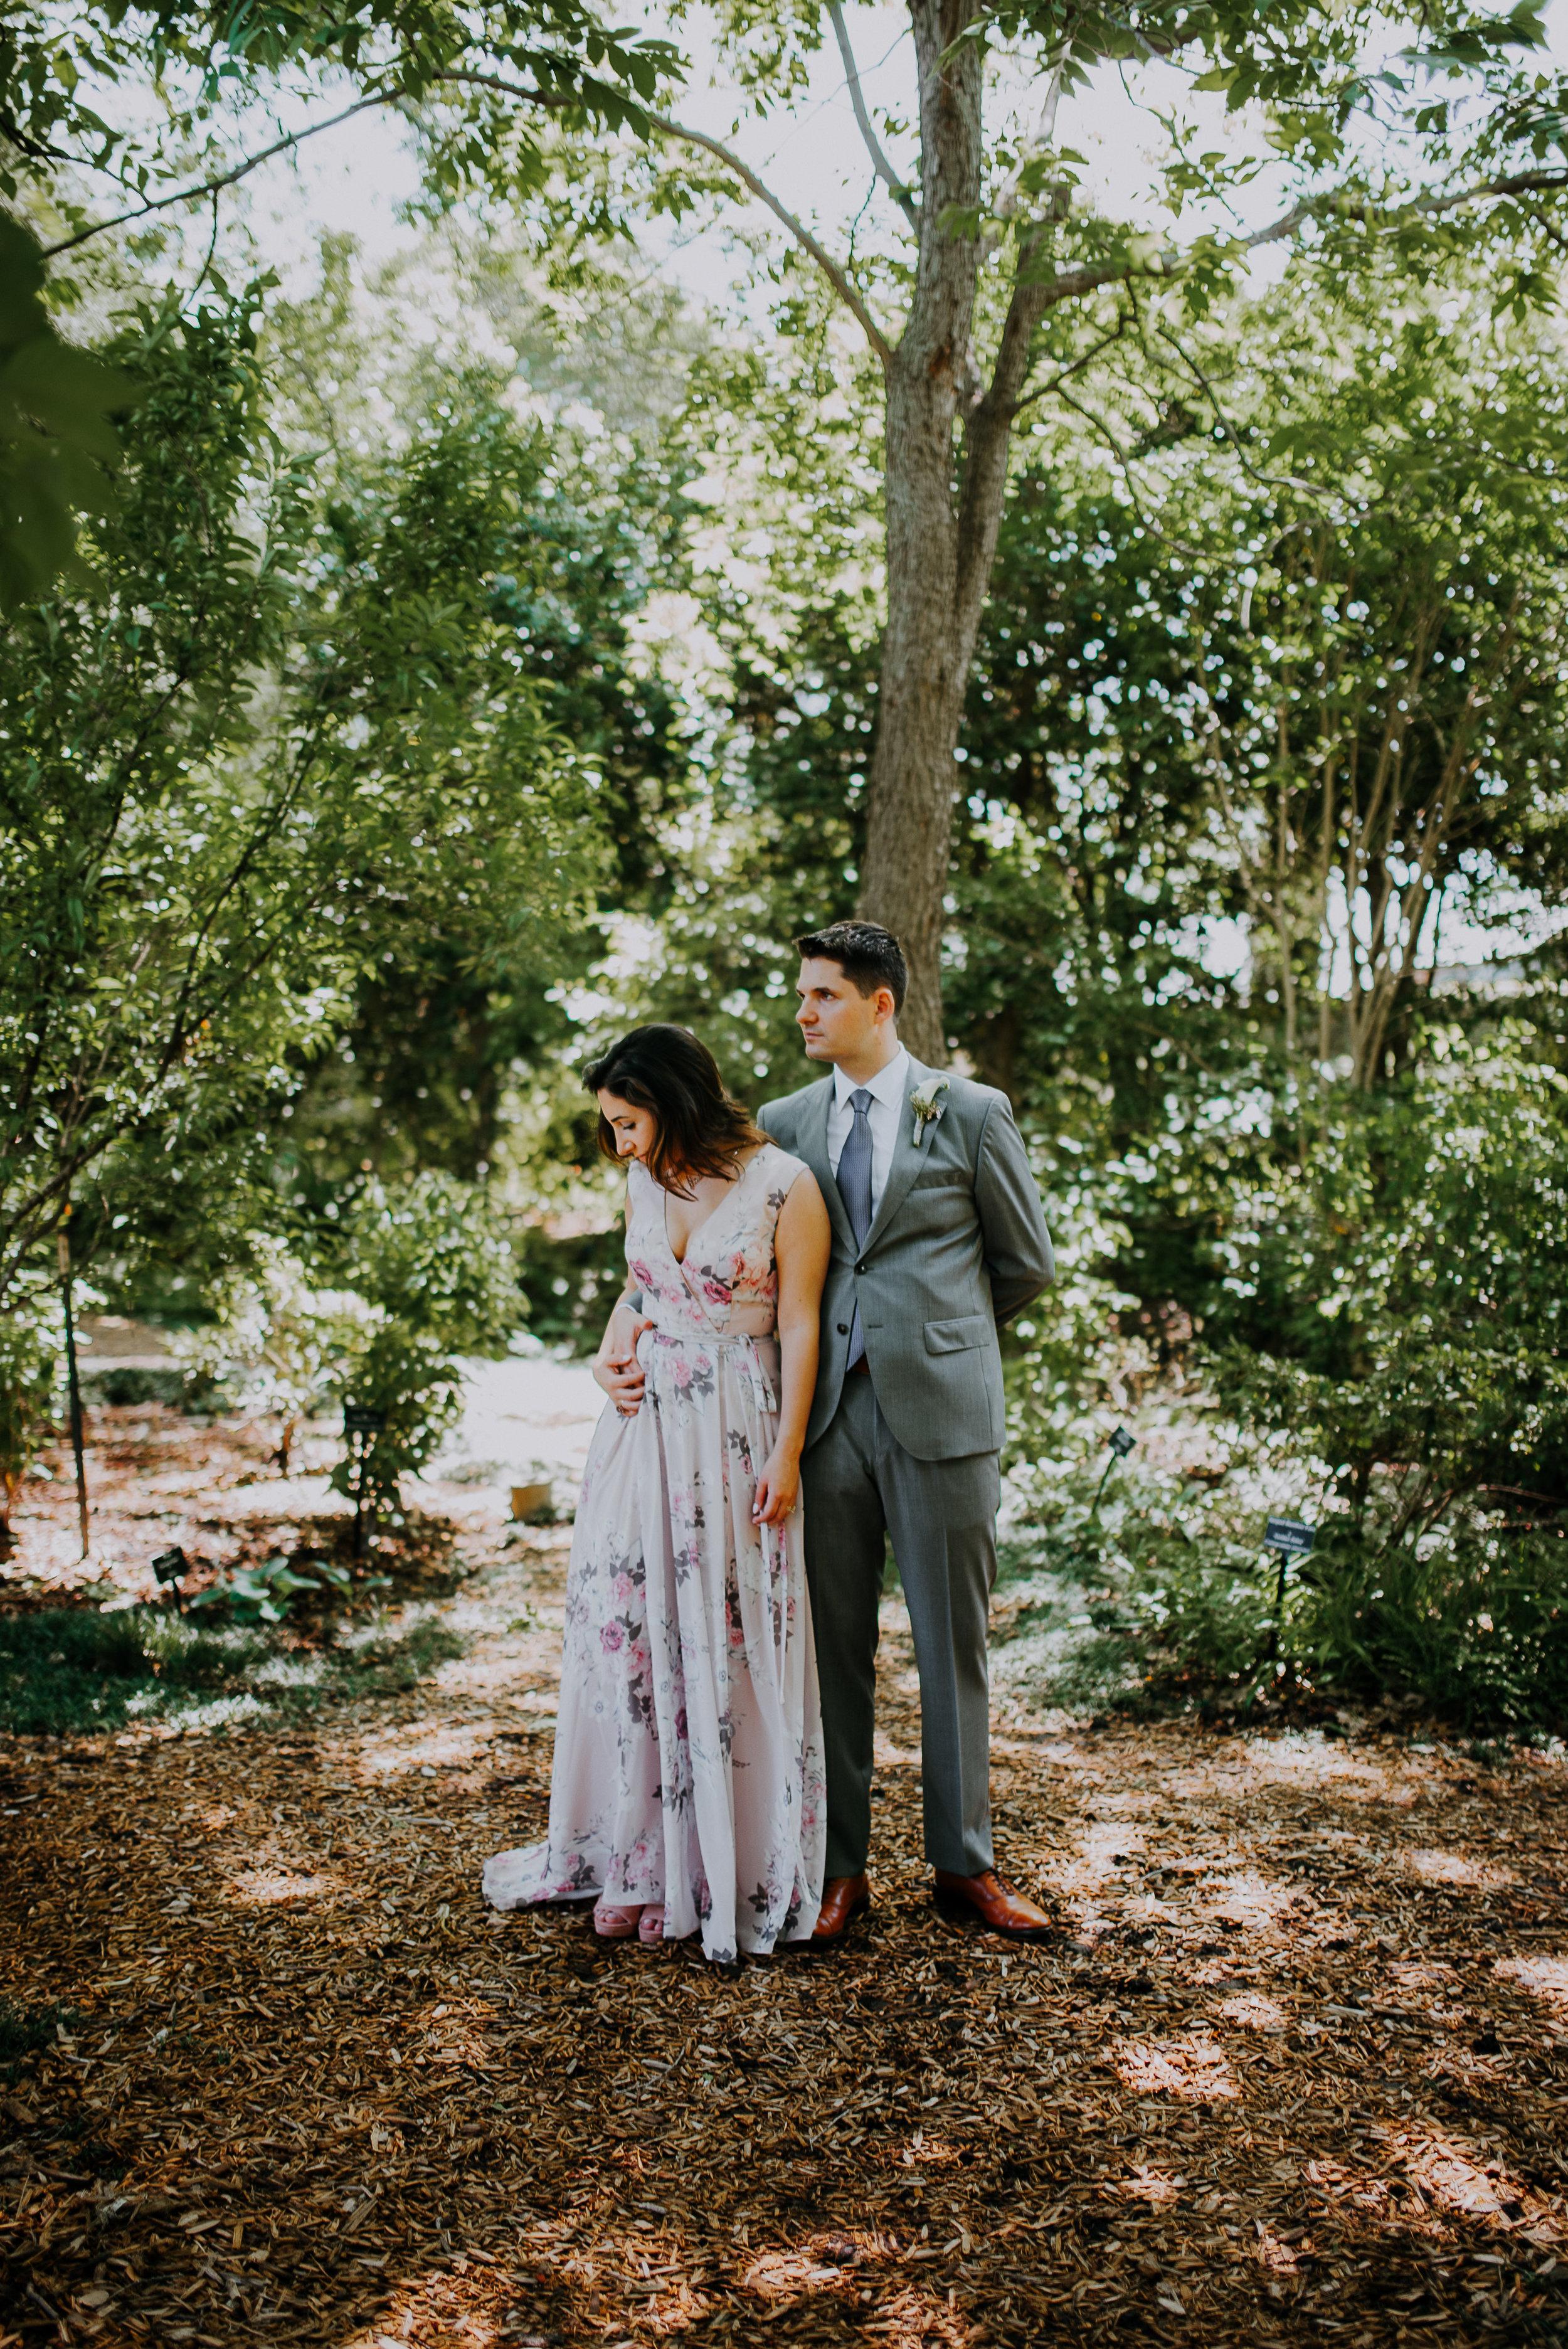 Dallas-fort-worth-wedding-photographer-dallas-arboretum-intimate-wedding-dallas-texas-24